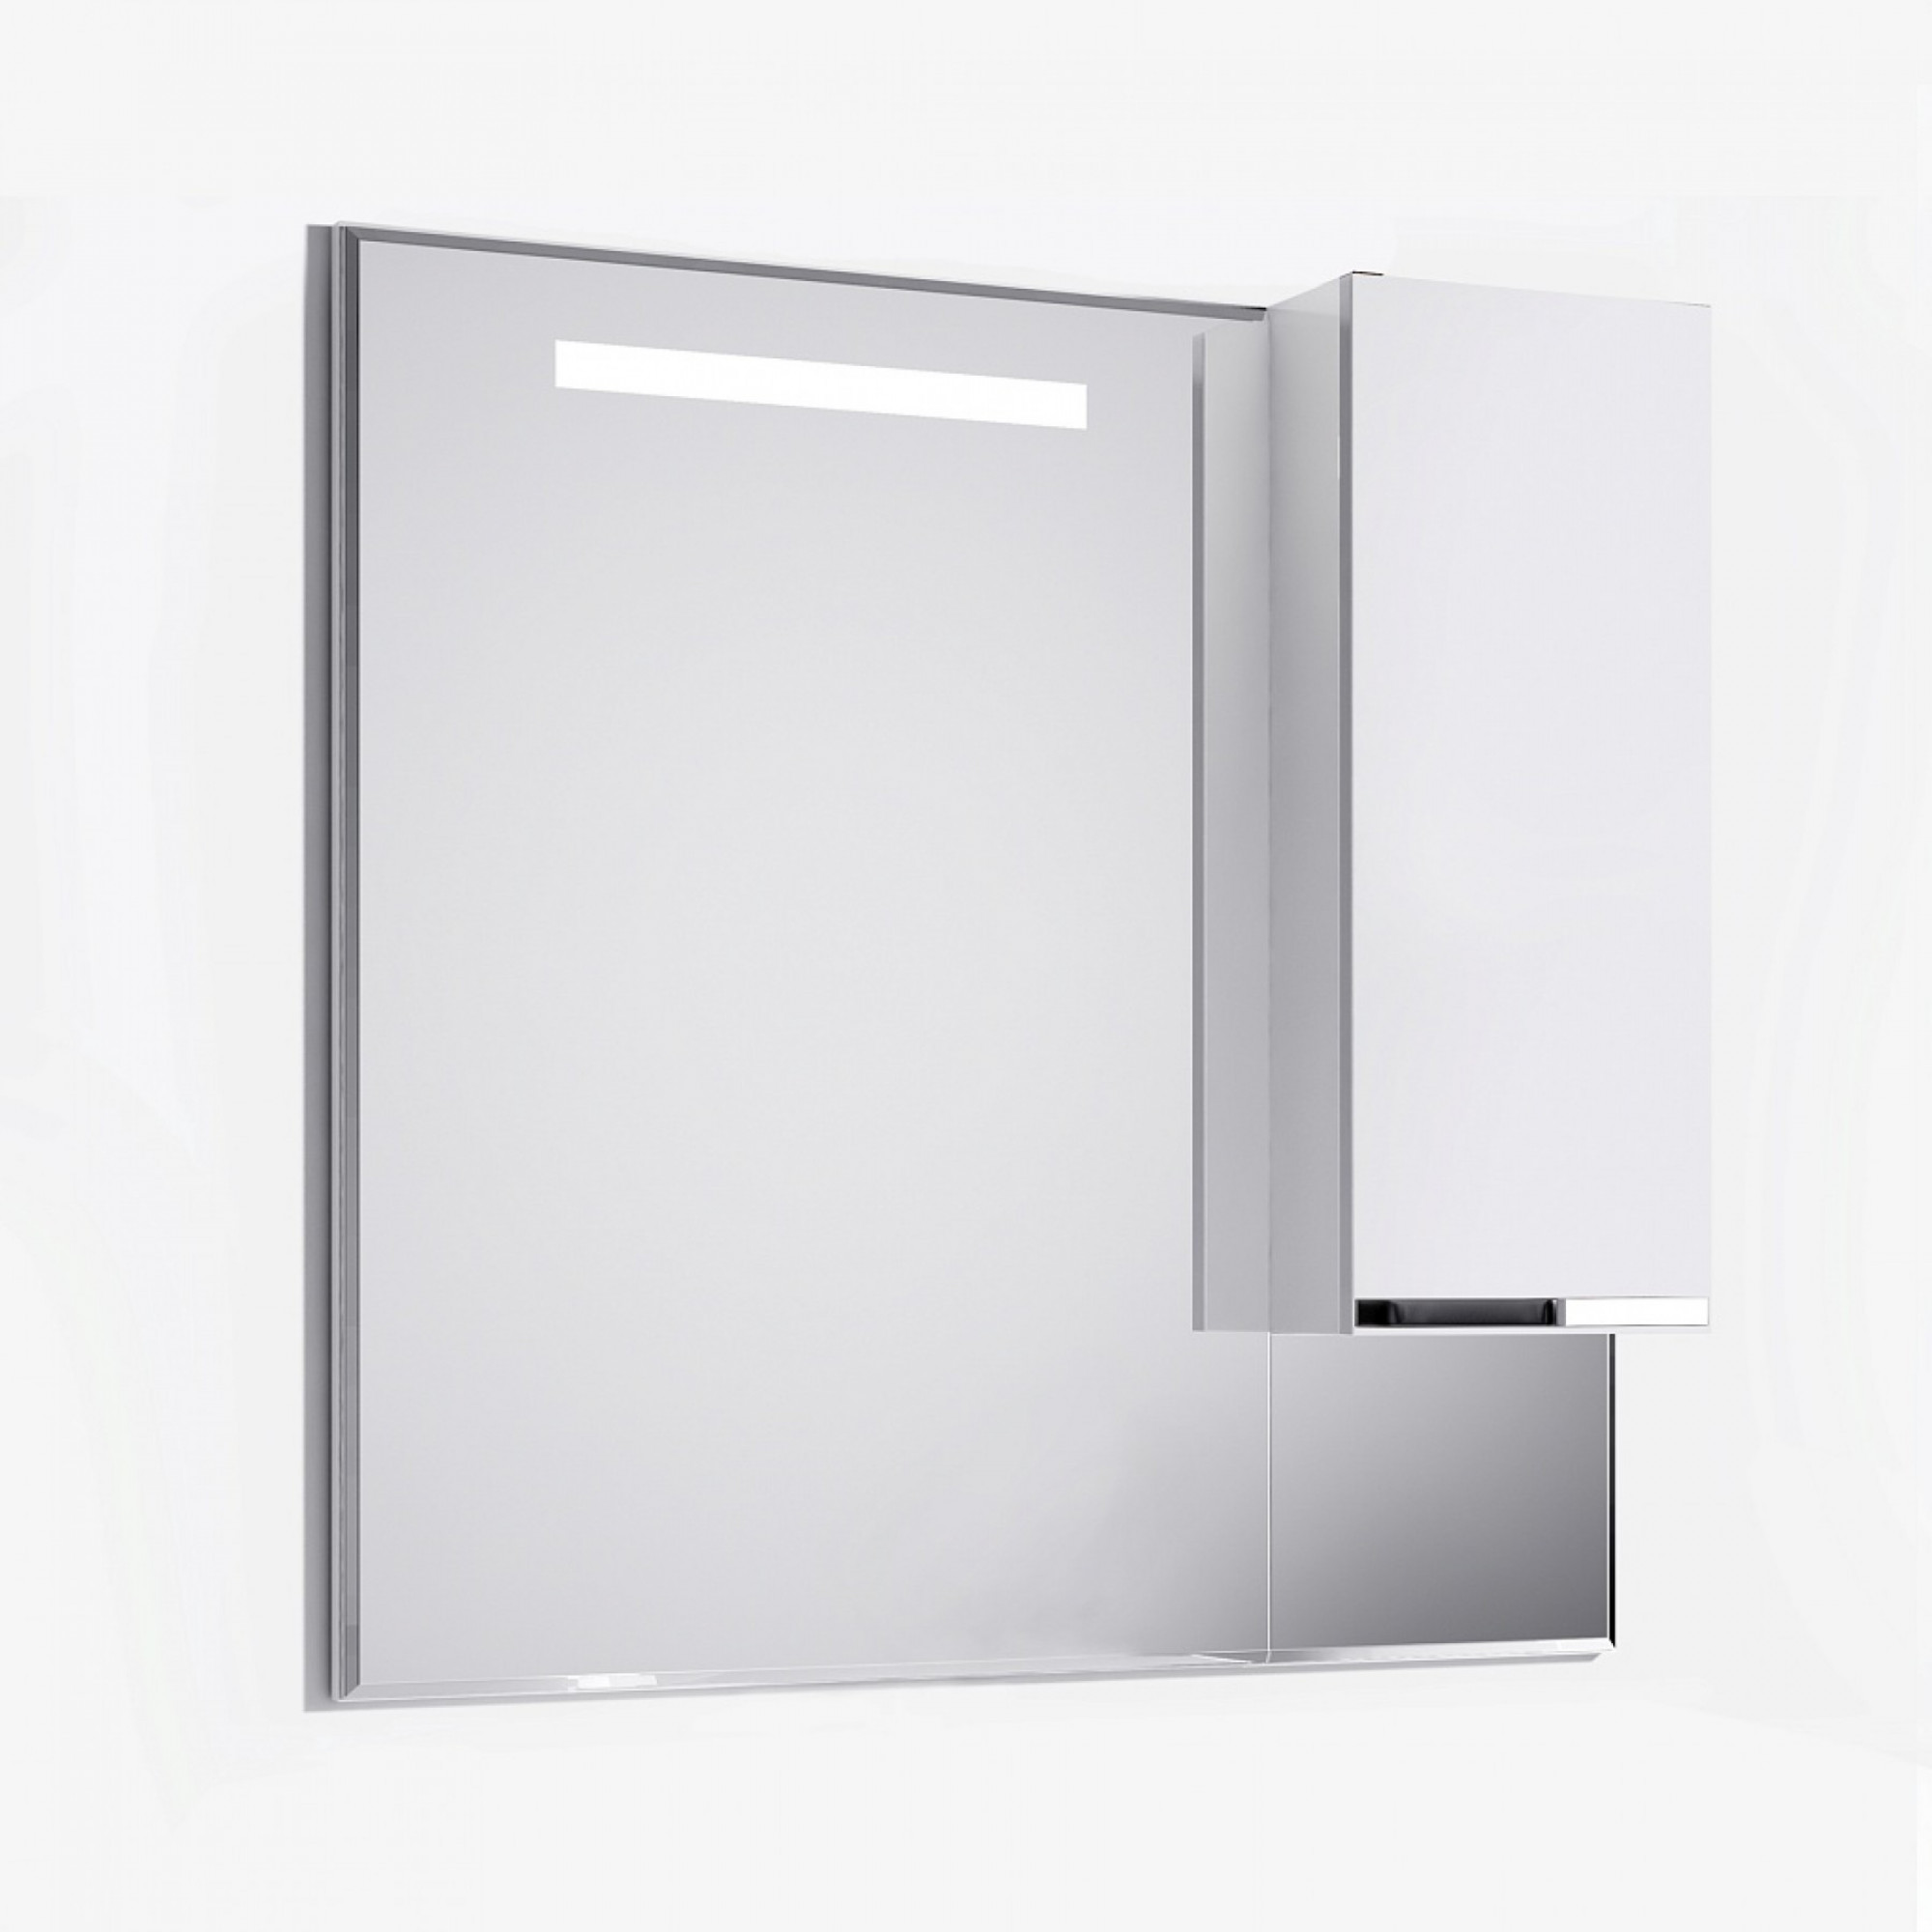 Зеркало-шкаф Latte 100 белый +9 650 руб.